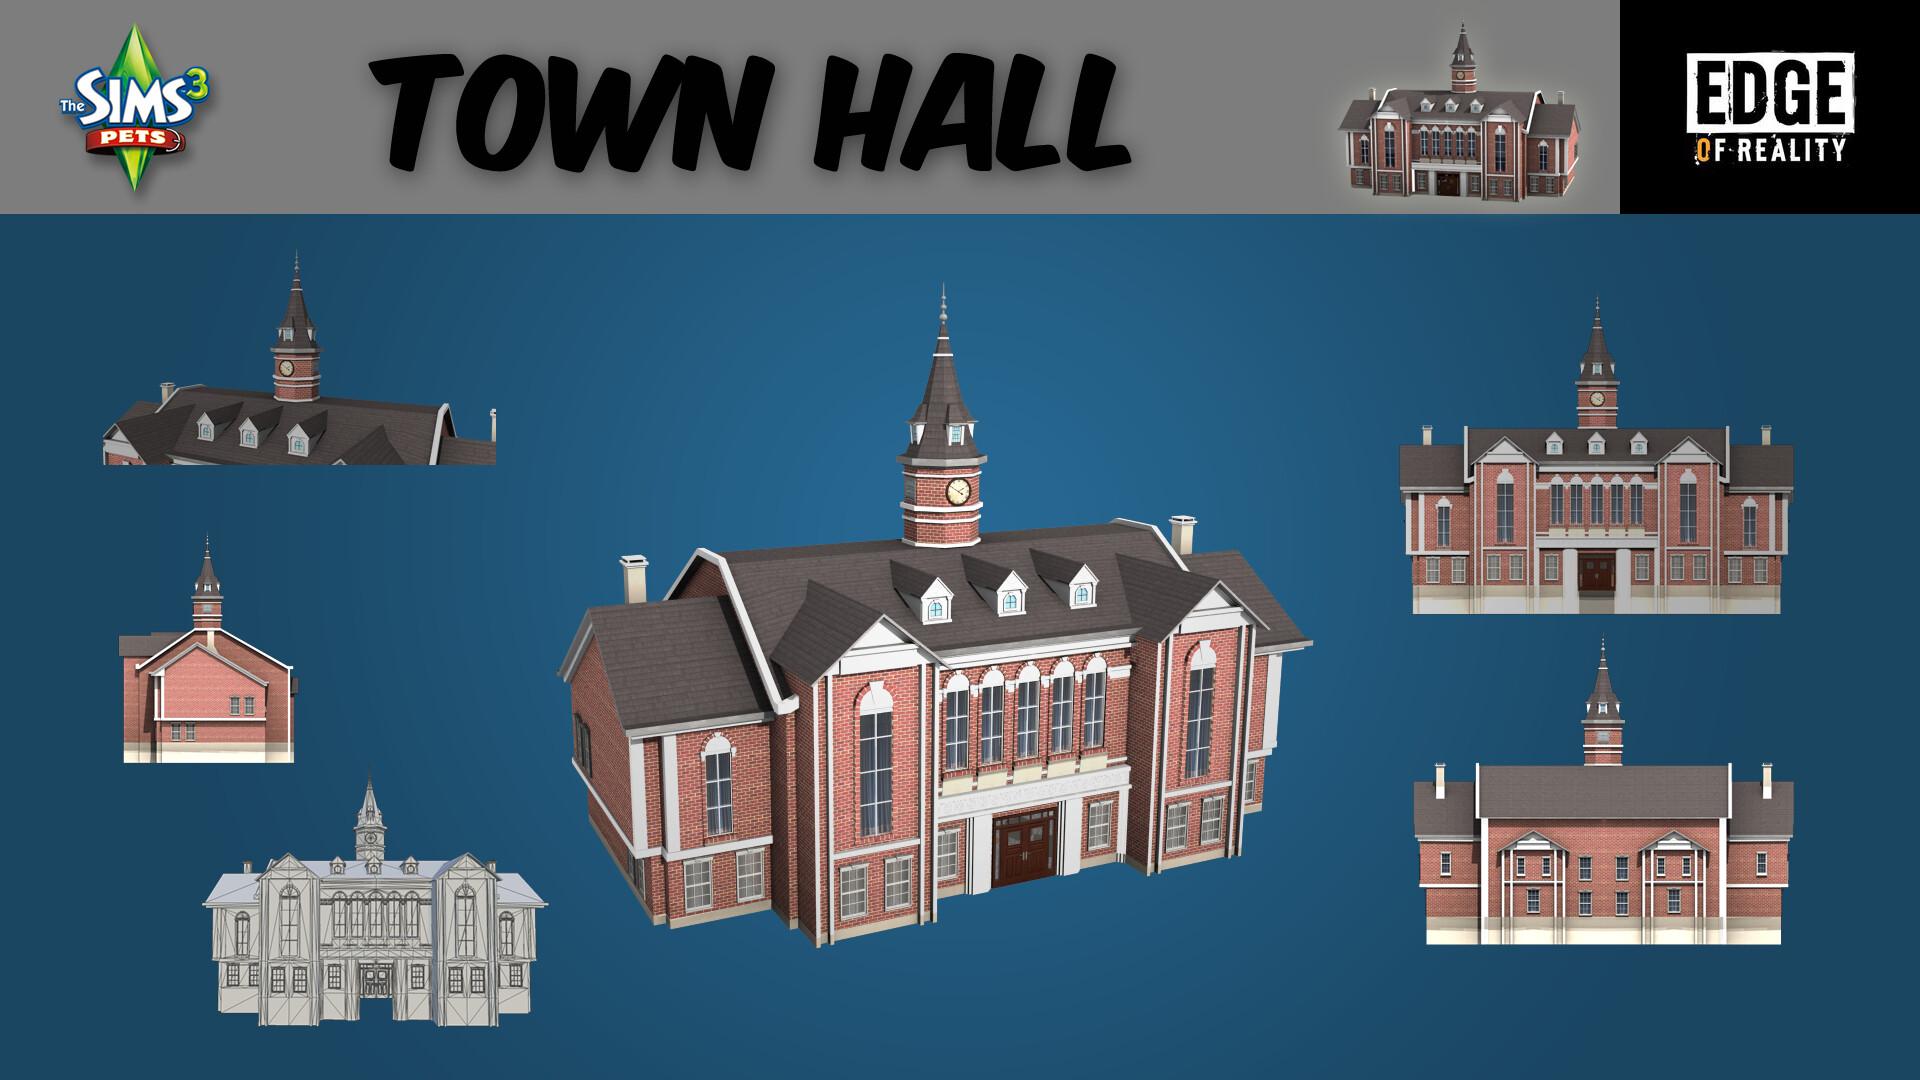 Markel milanes townhall